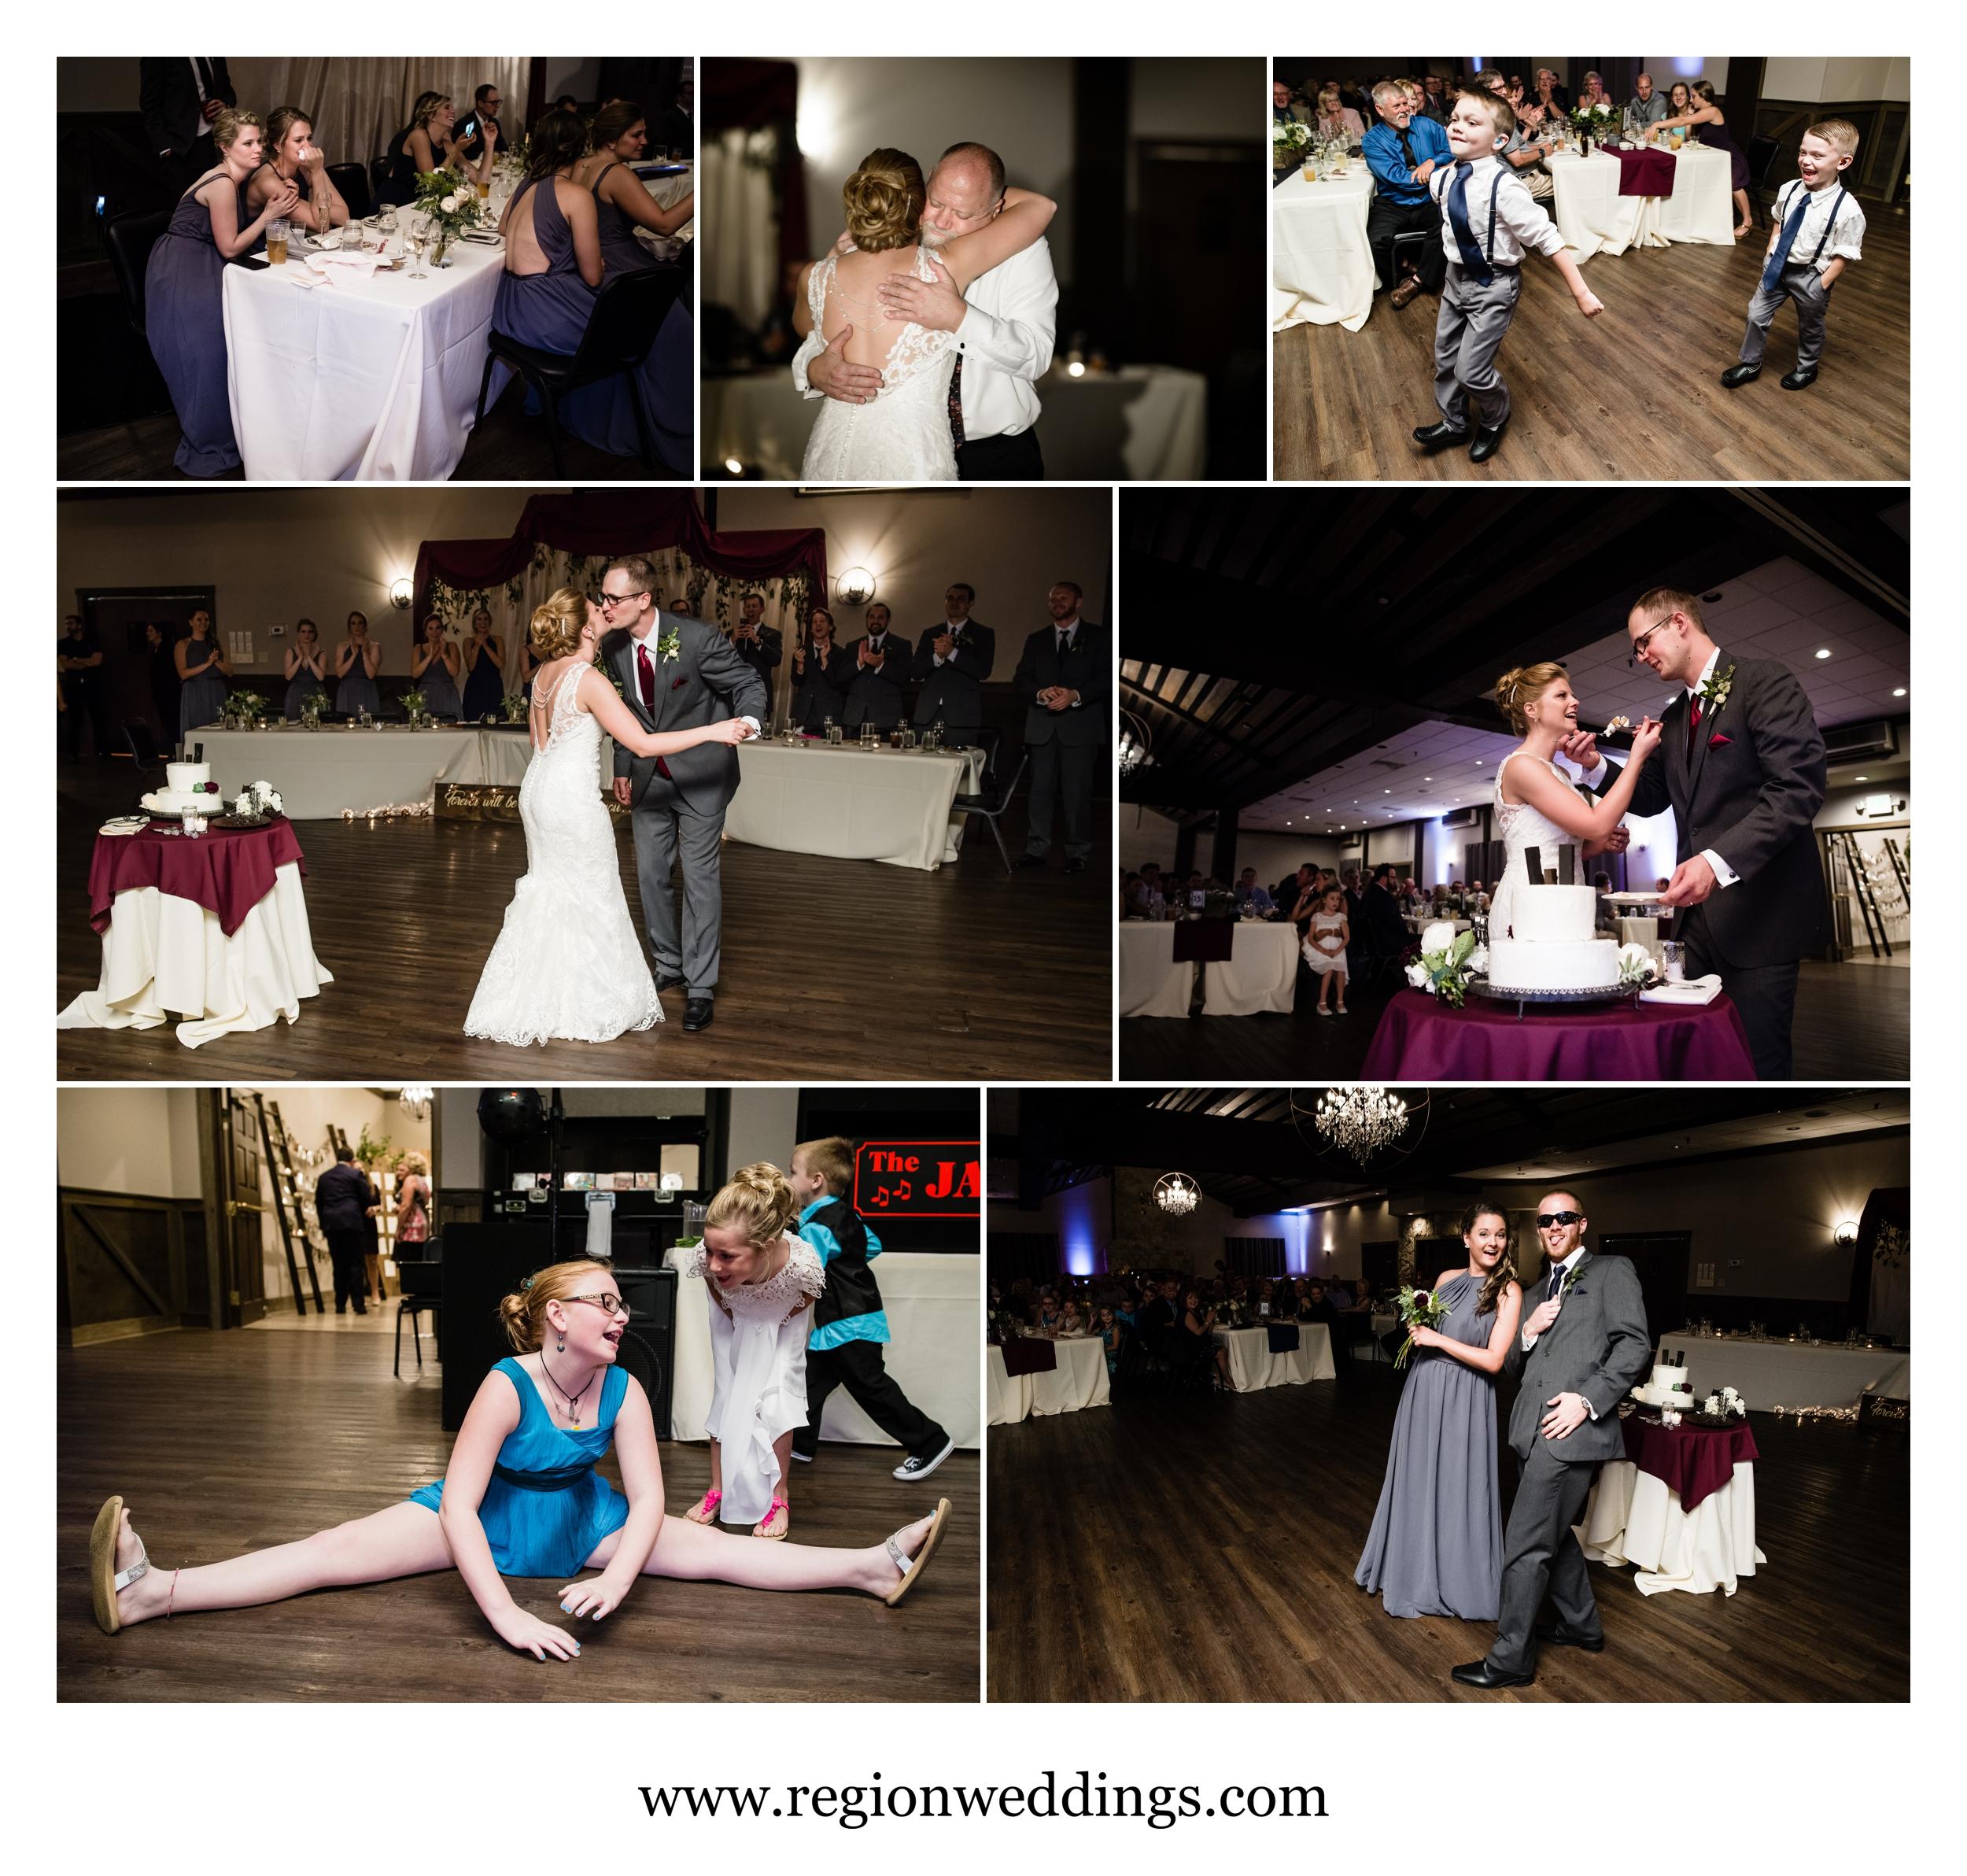 Wedding reception moments at The Market in Valparaiso, Indiana.